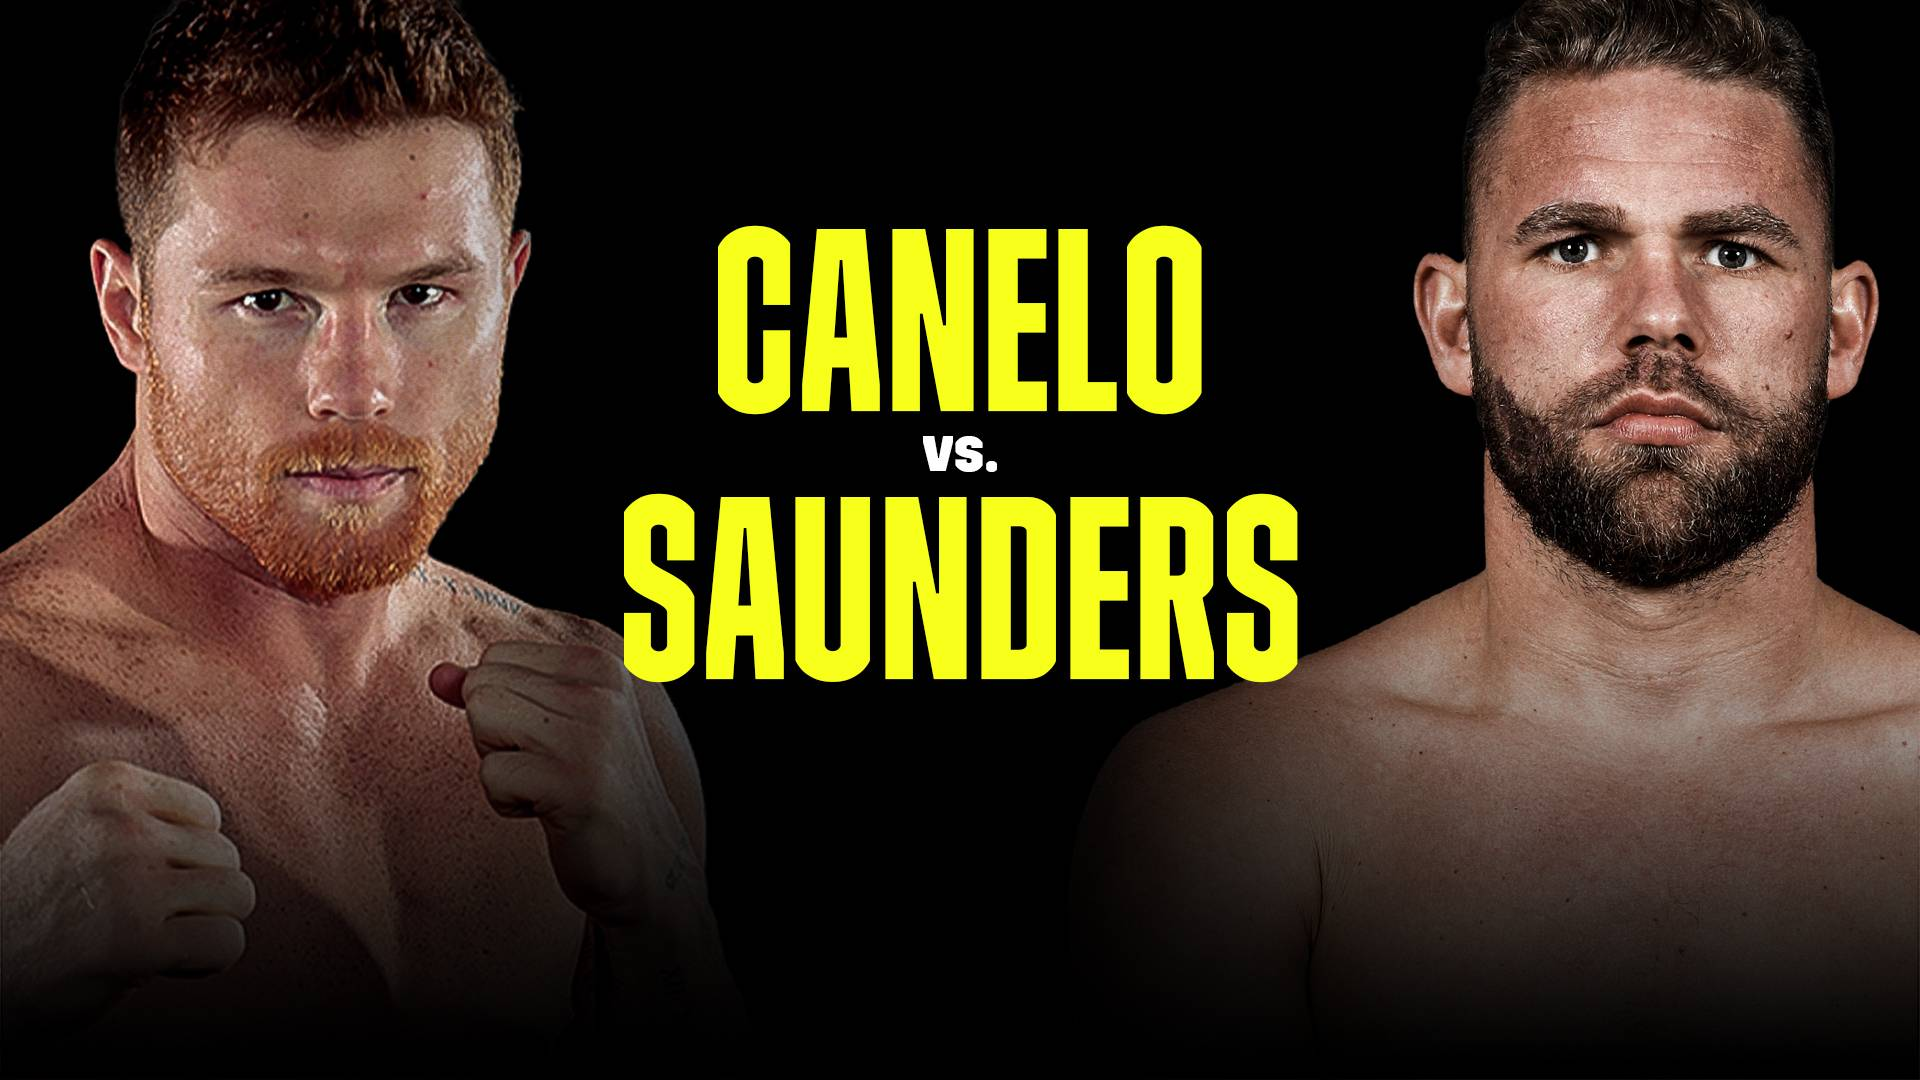 Watch Canelo Alvarez vs Billy Joe Saunders Live Stream Reddit Free Online - TV Channels, Start Time, Date, Venue, Live Fight, Lineups, and Updates